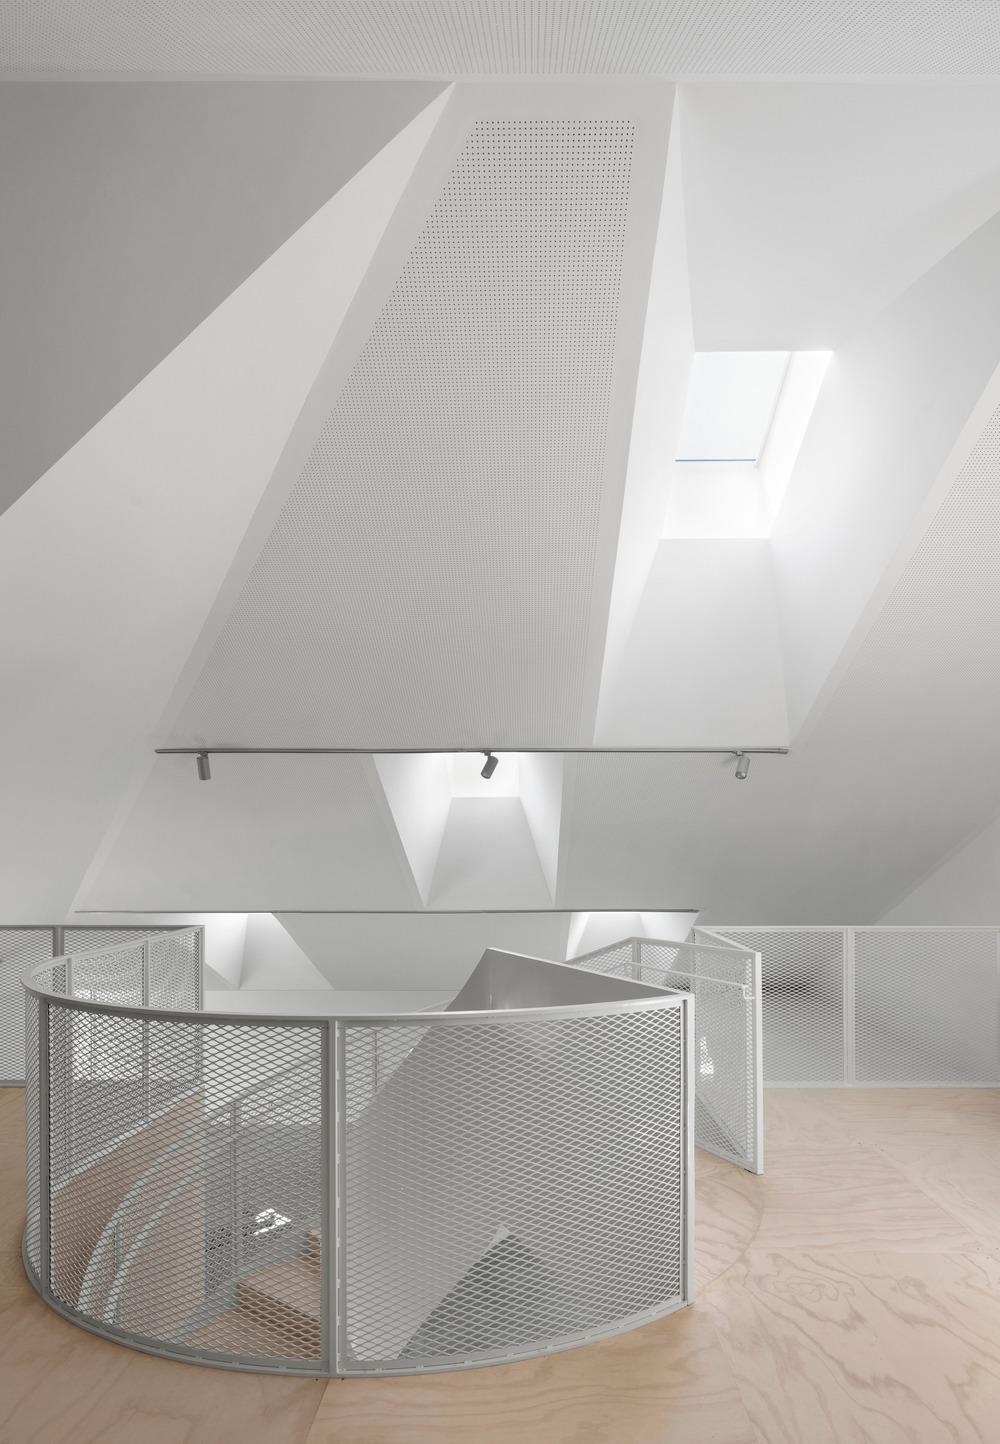 residencia artistas de bourgeois lechasseur - foto adrien williams (6)